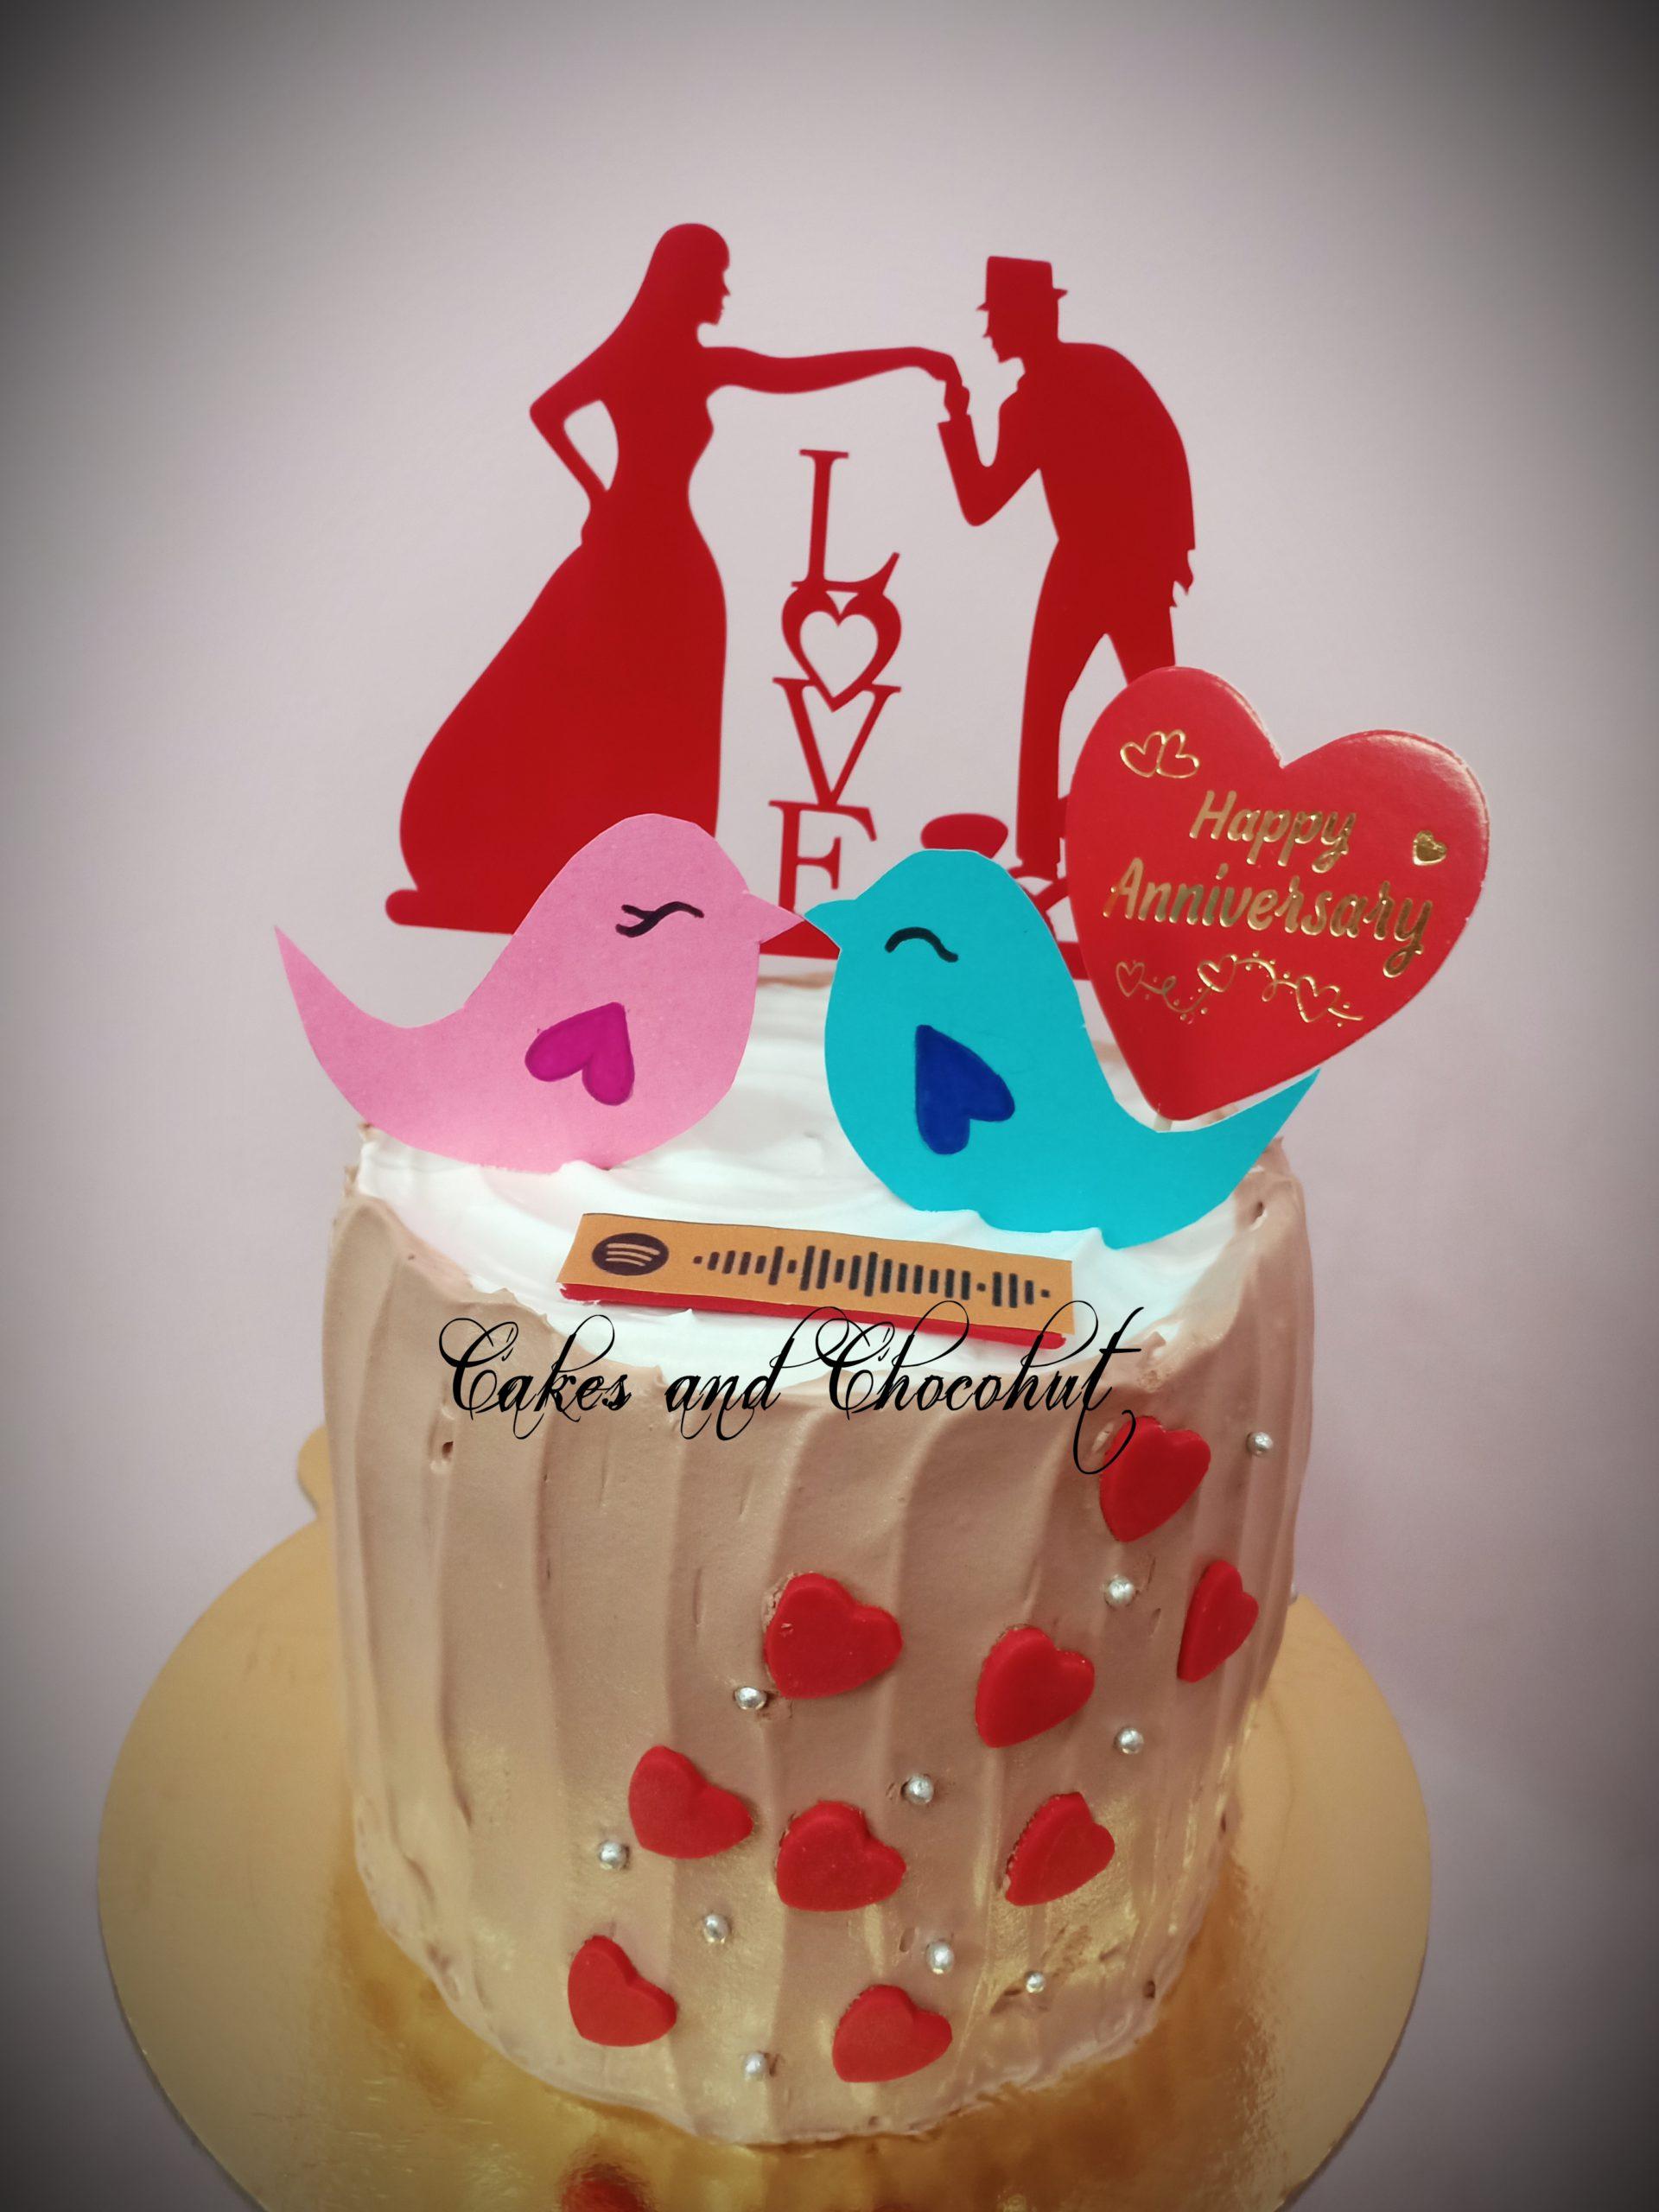 Anniversary Cake/Spotify Cake Designs, Images, Price Near Me